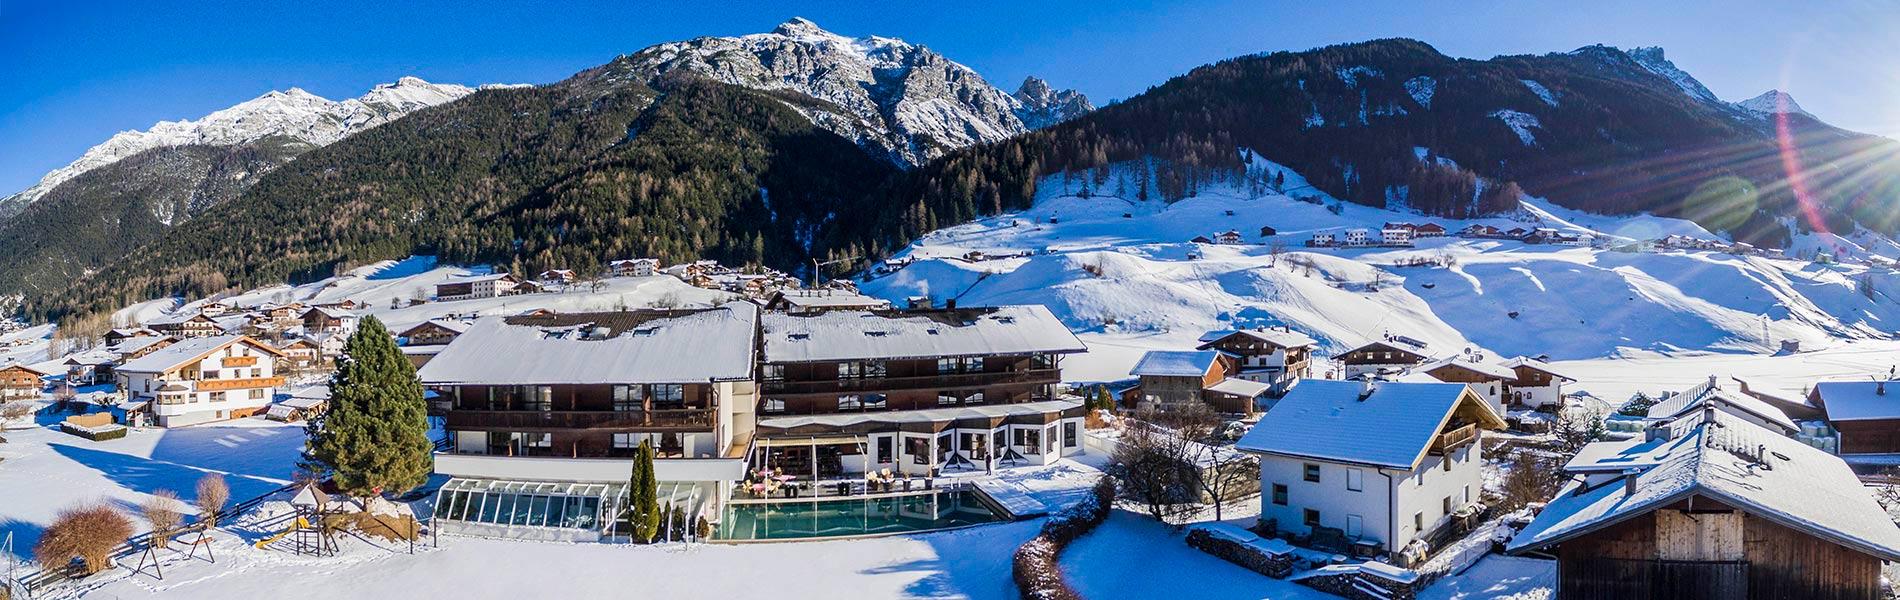 Happy-Stubai-Hotel-Neustift-Tirol-Austria-Hostel-Winterurlaub-im-Stubaital